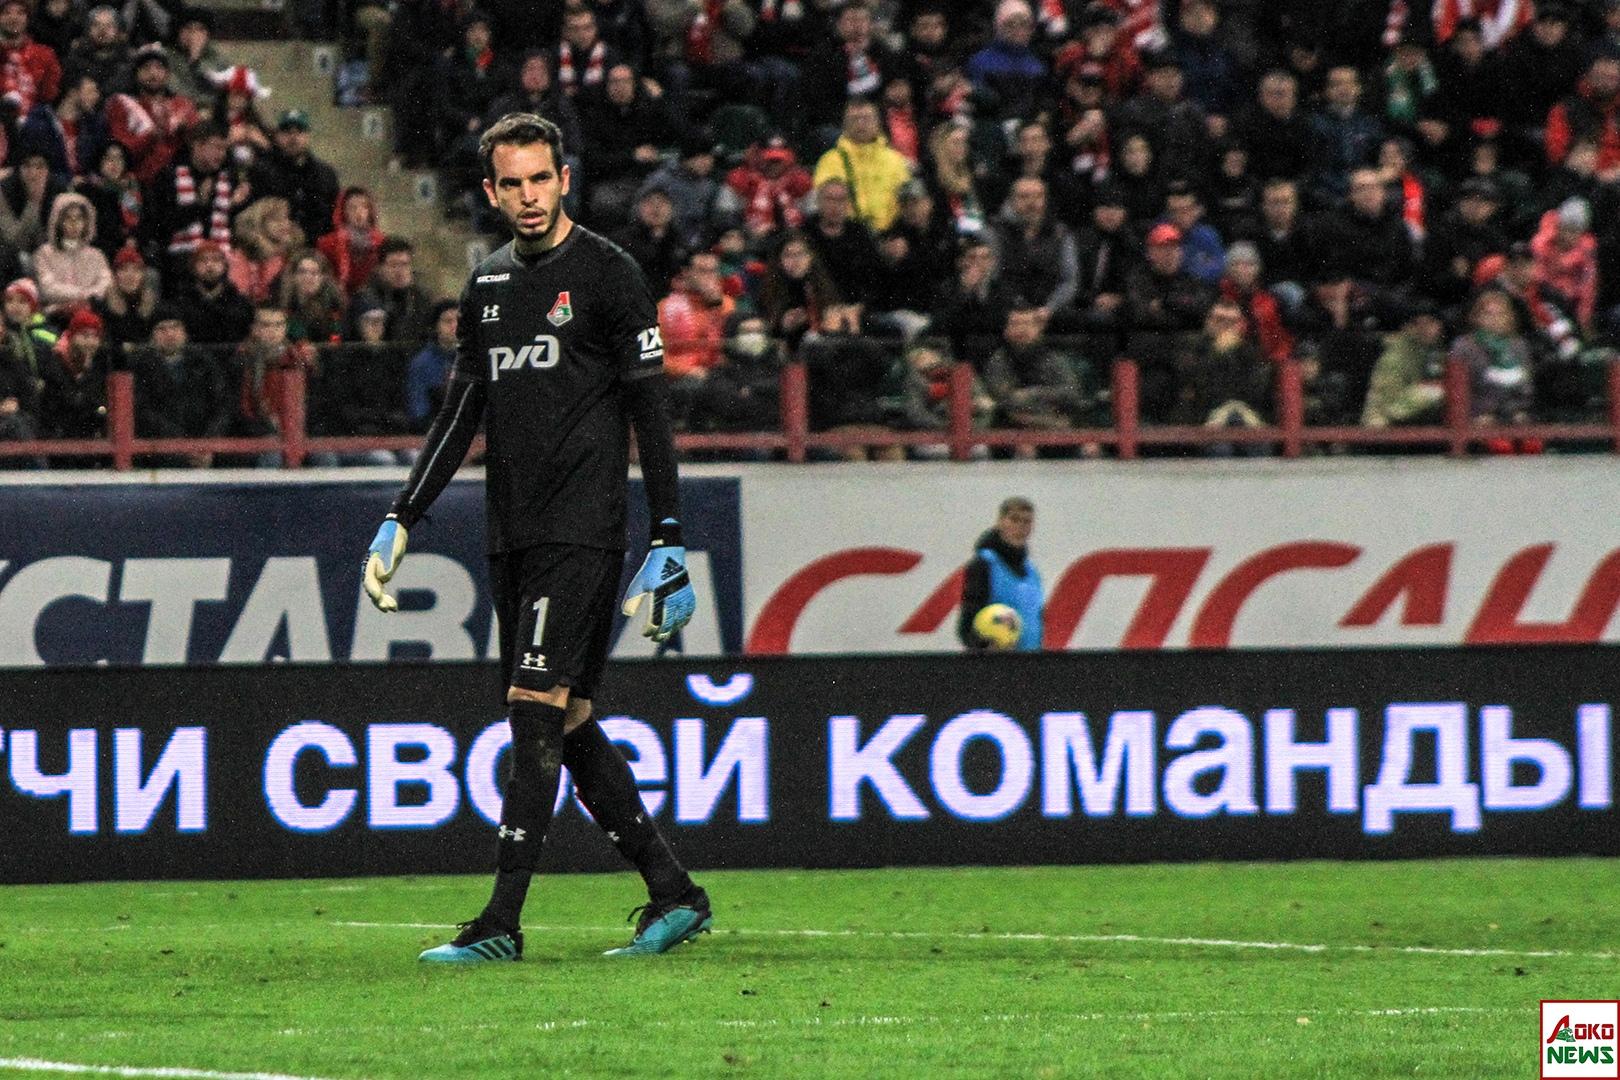 Локомотив - Спартак 2019/20. Фото: Дмитрий Бурдонов / Loko.News